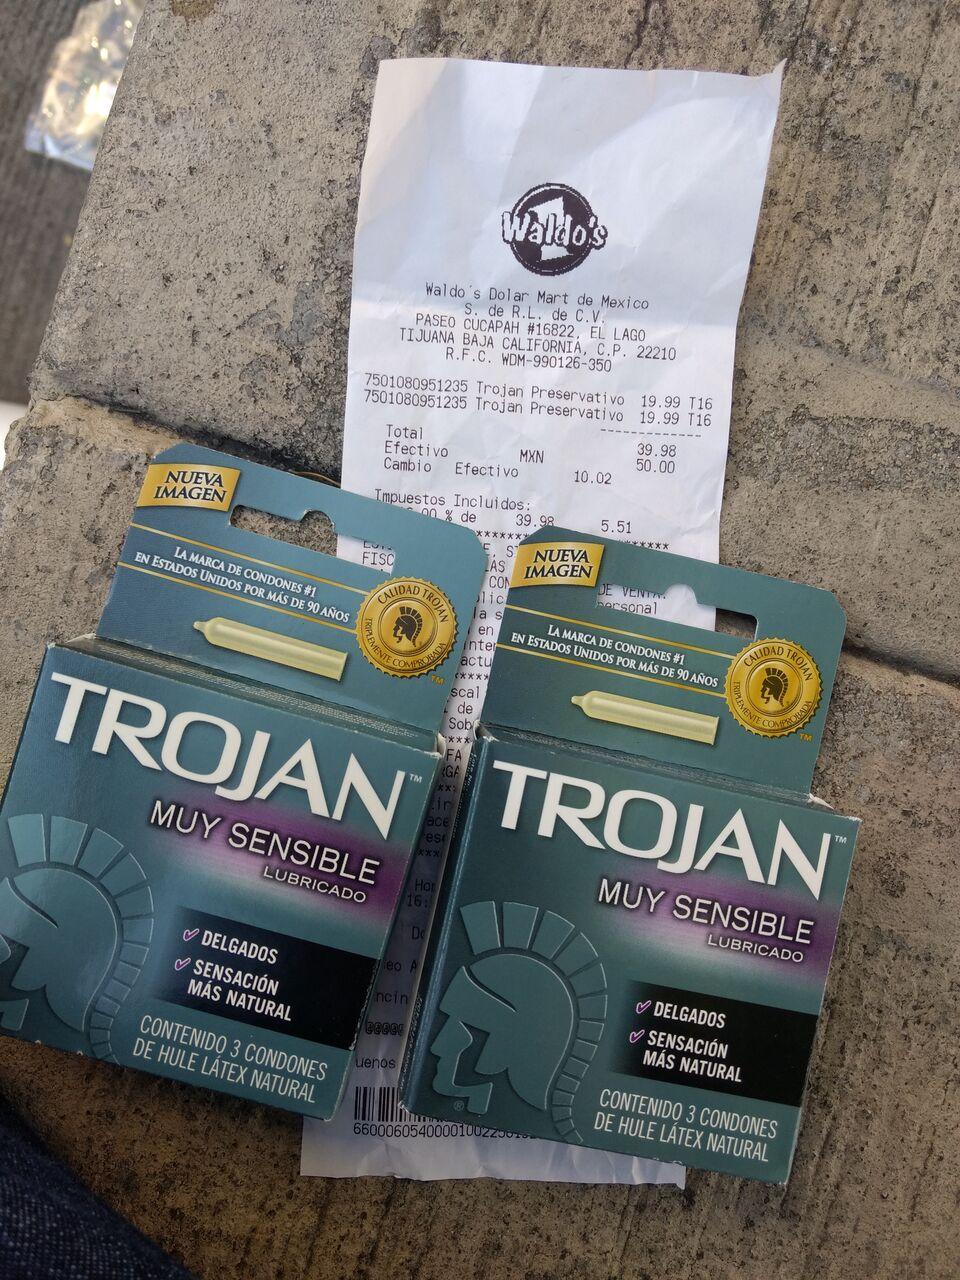 Waldos Mart: Condones Trojan a $19.99